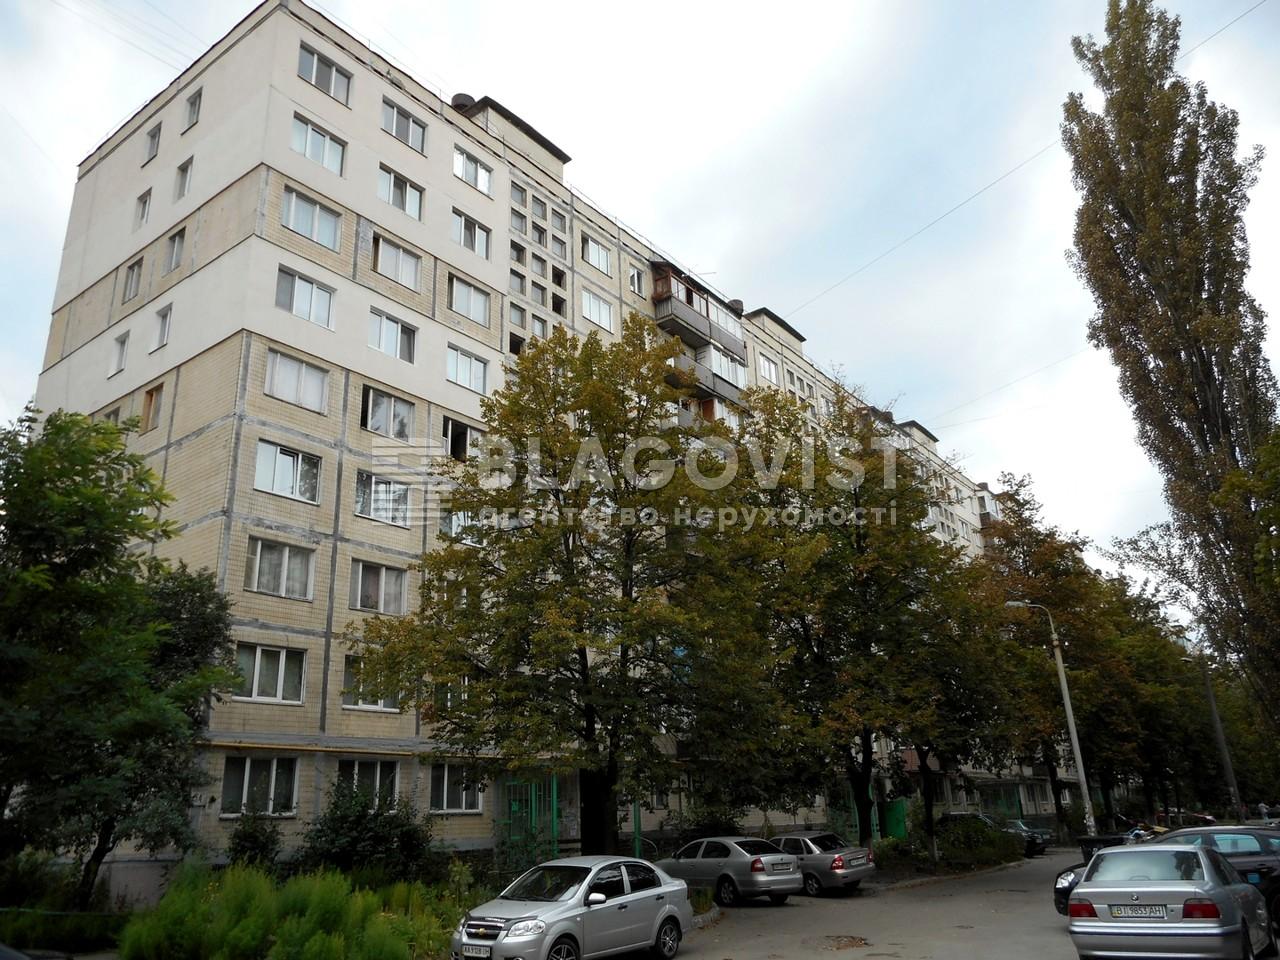 Квартира Z-1580769, Лятошинского, 14а, Киев - Фото 1